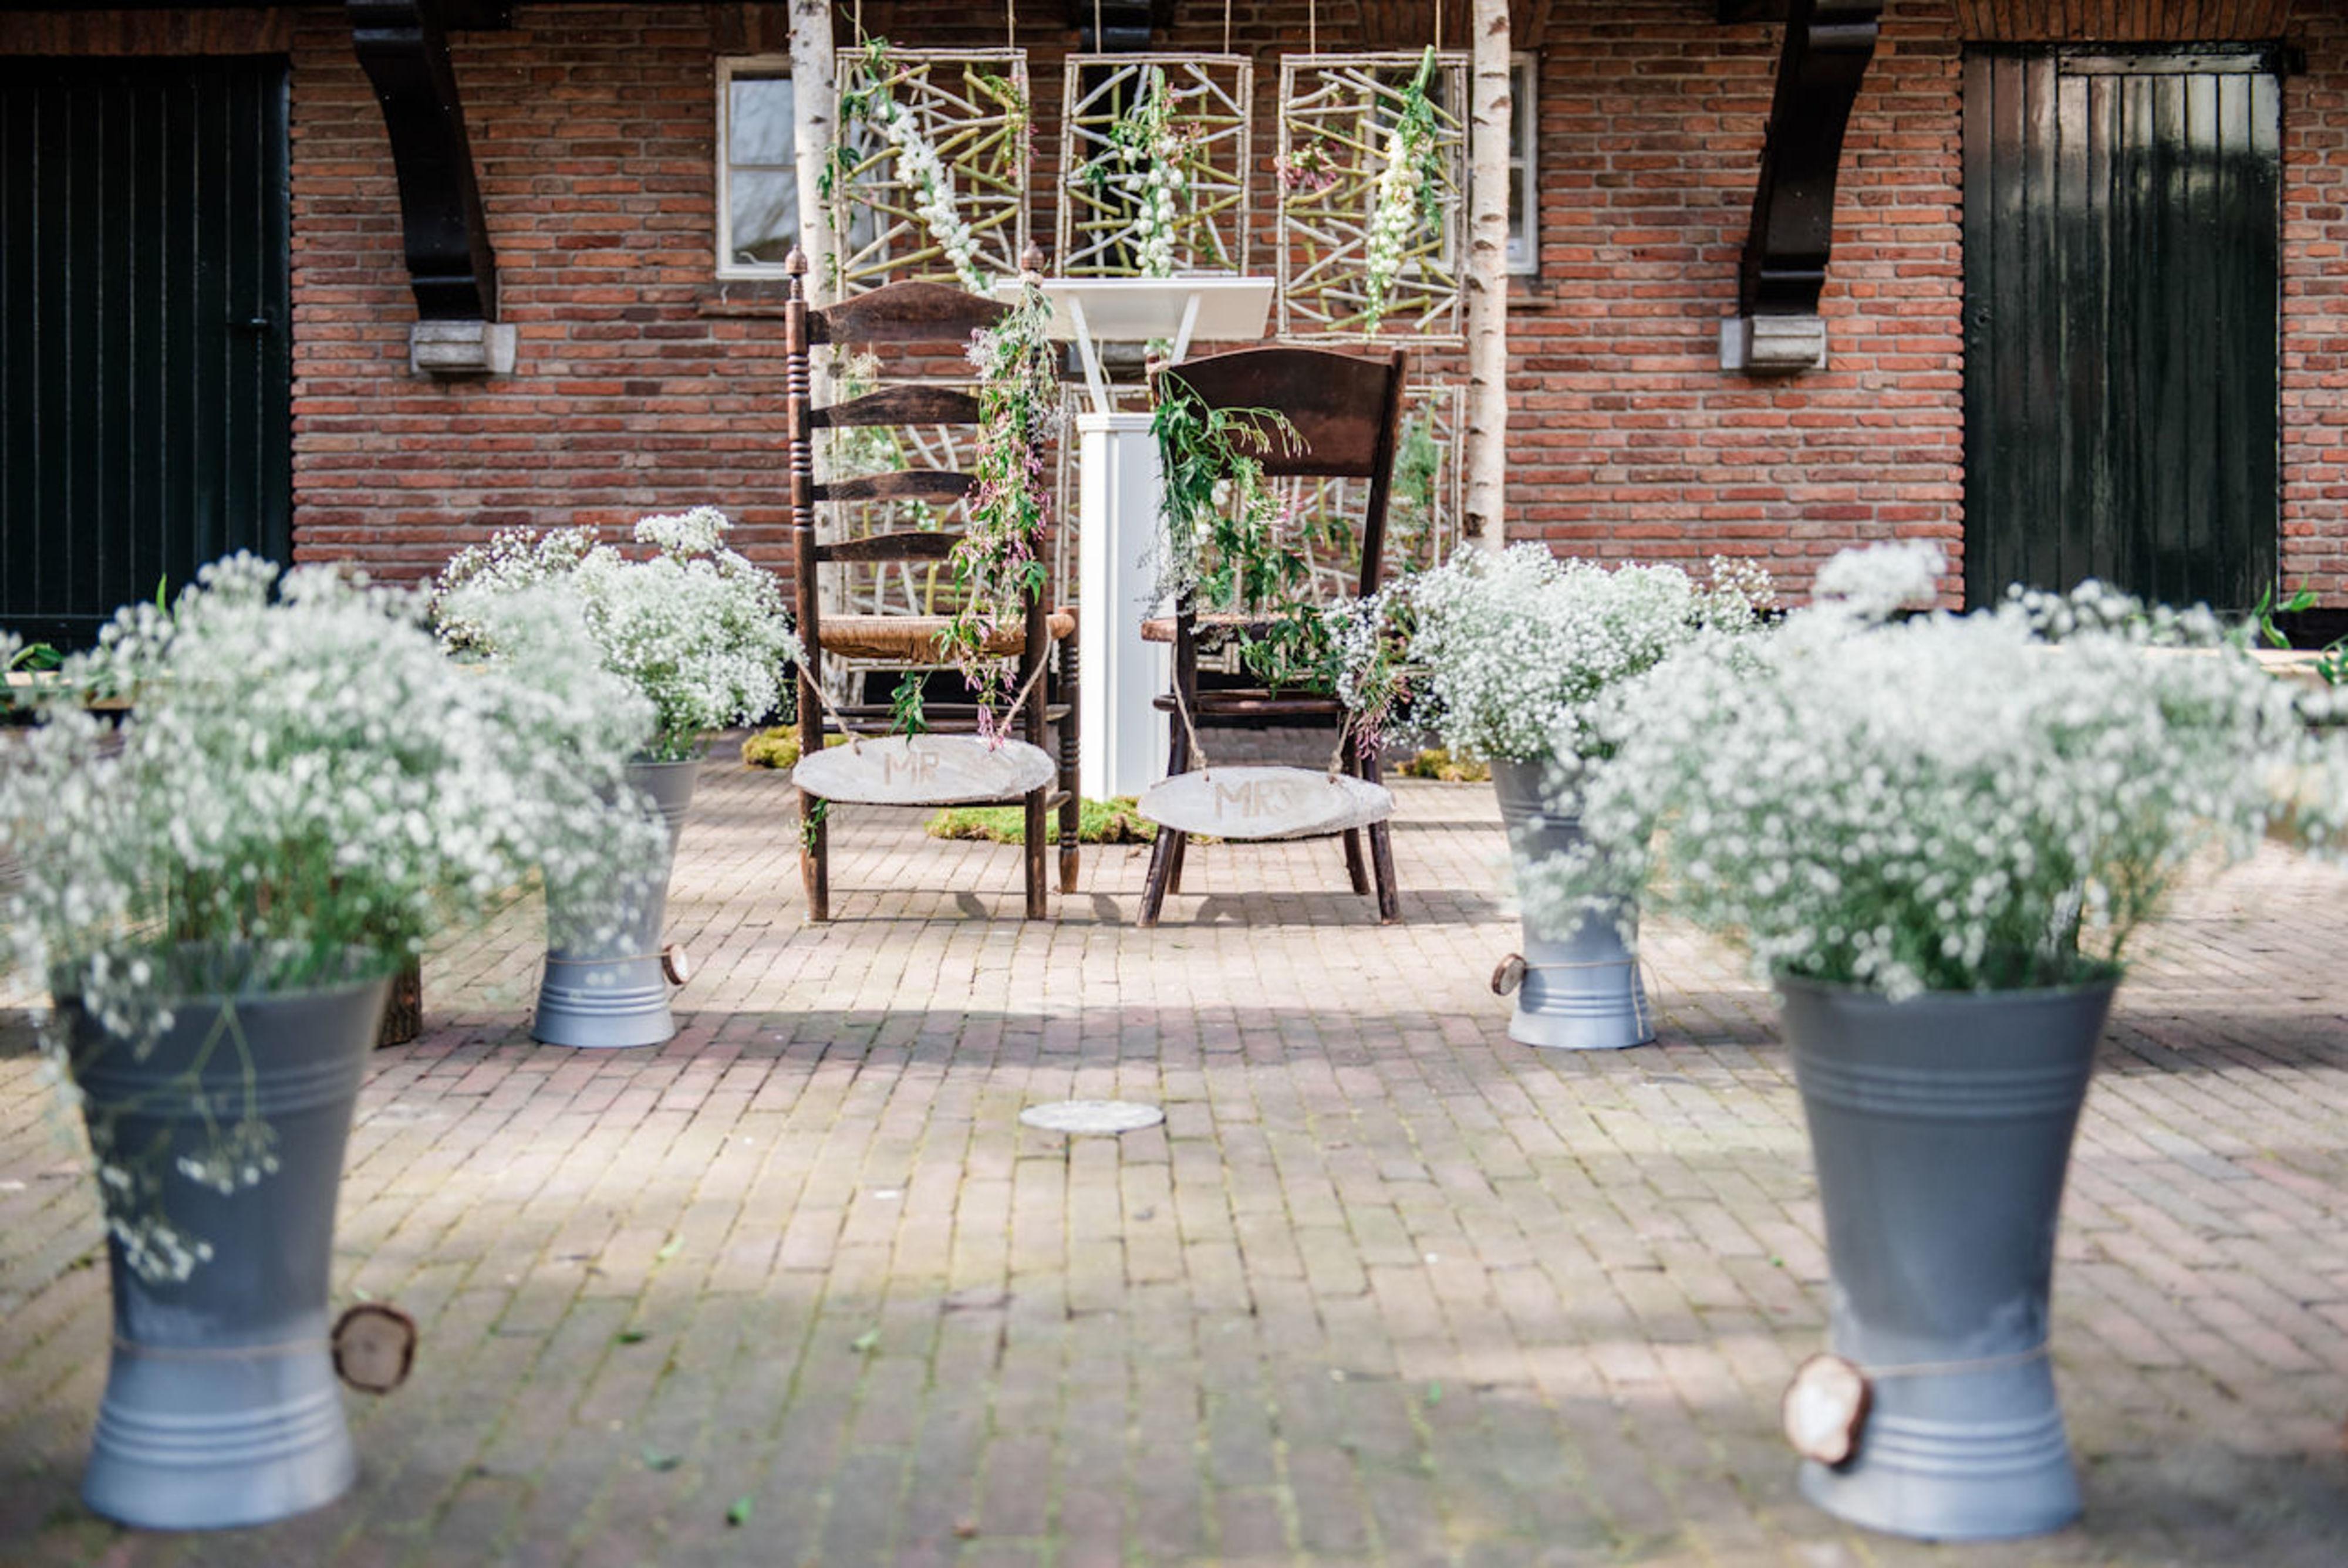 Trouwdecoratie Huwelijksceremonie